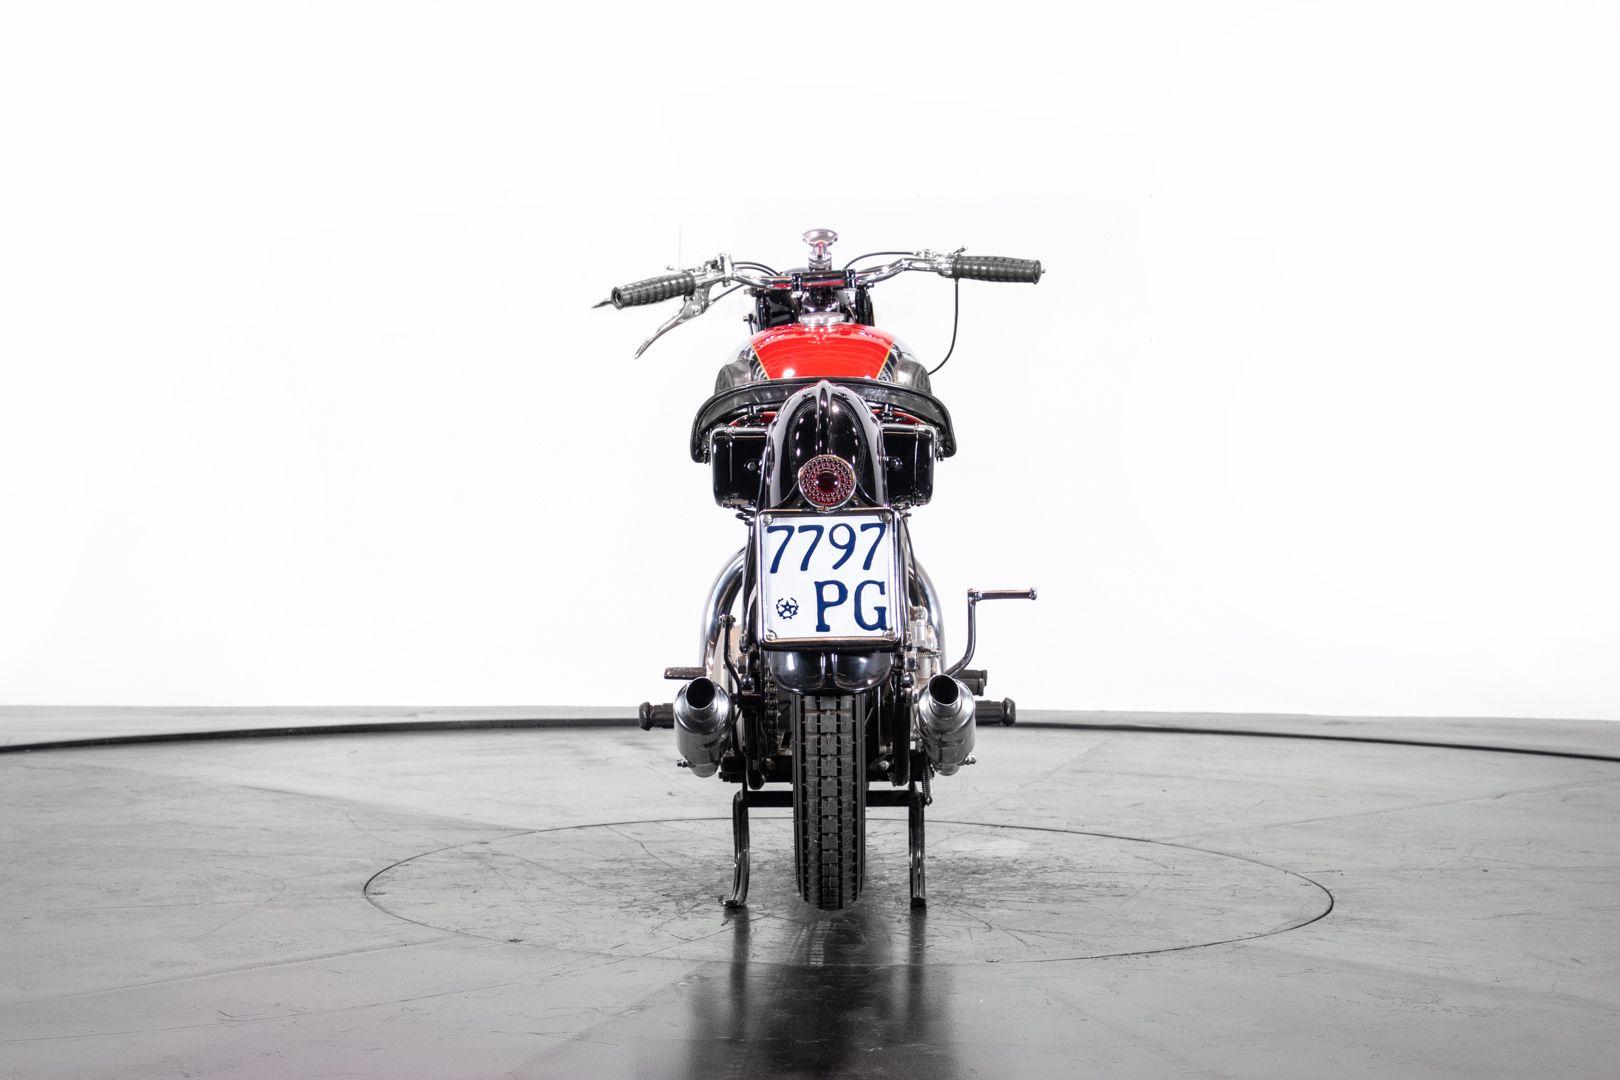 1939 Benelli 500 72507